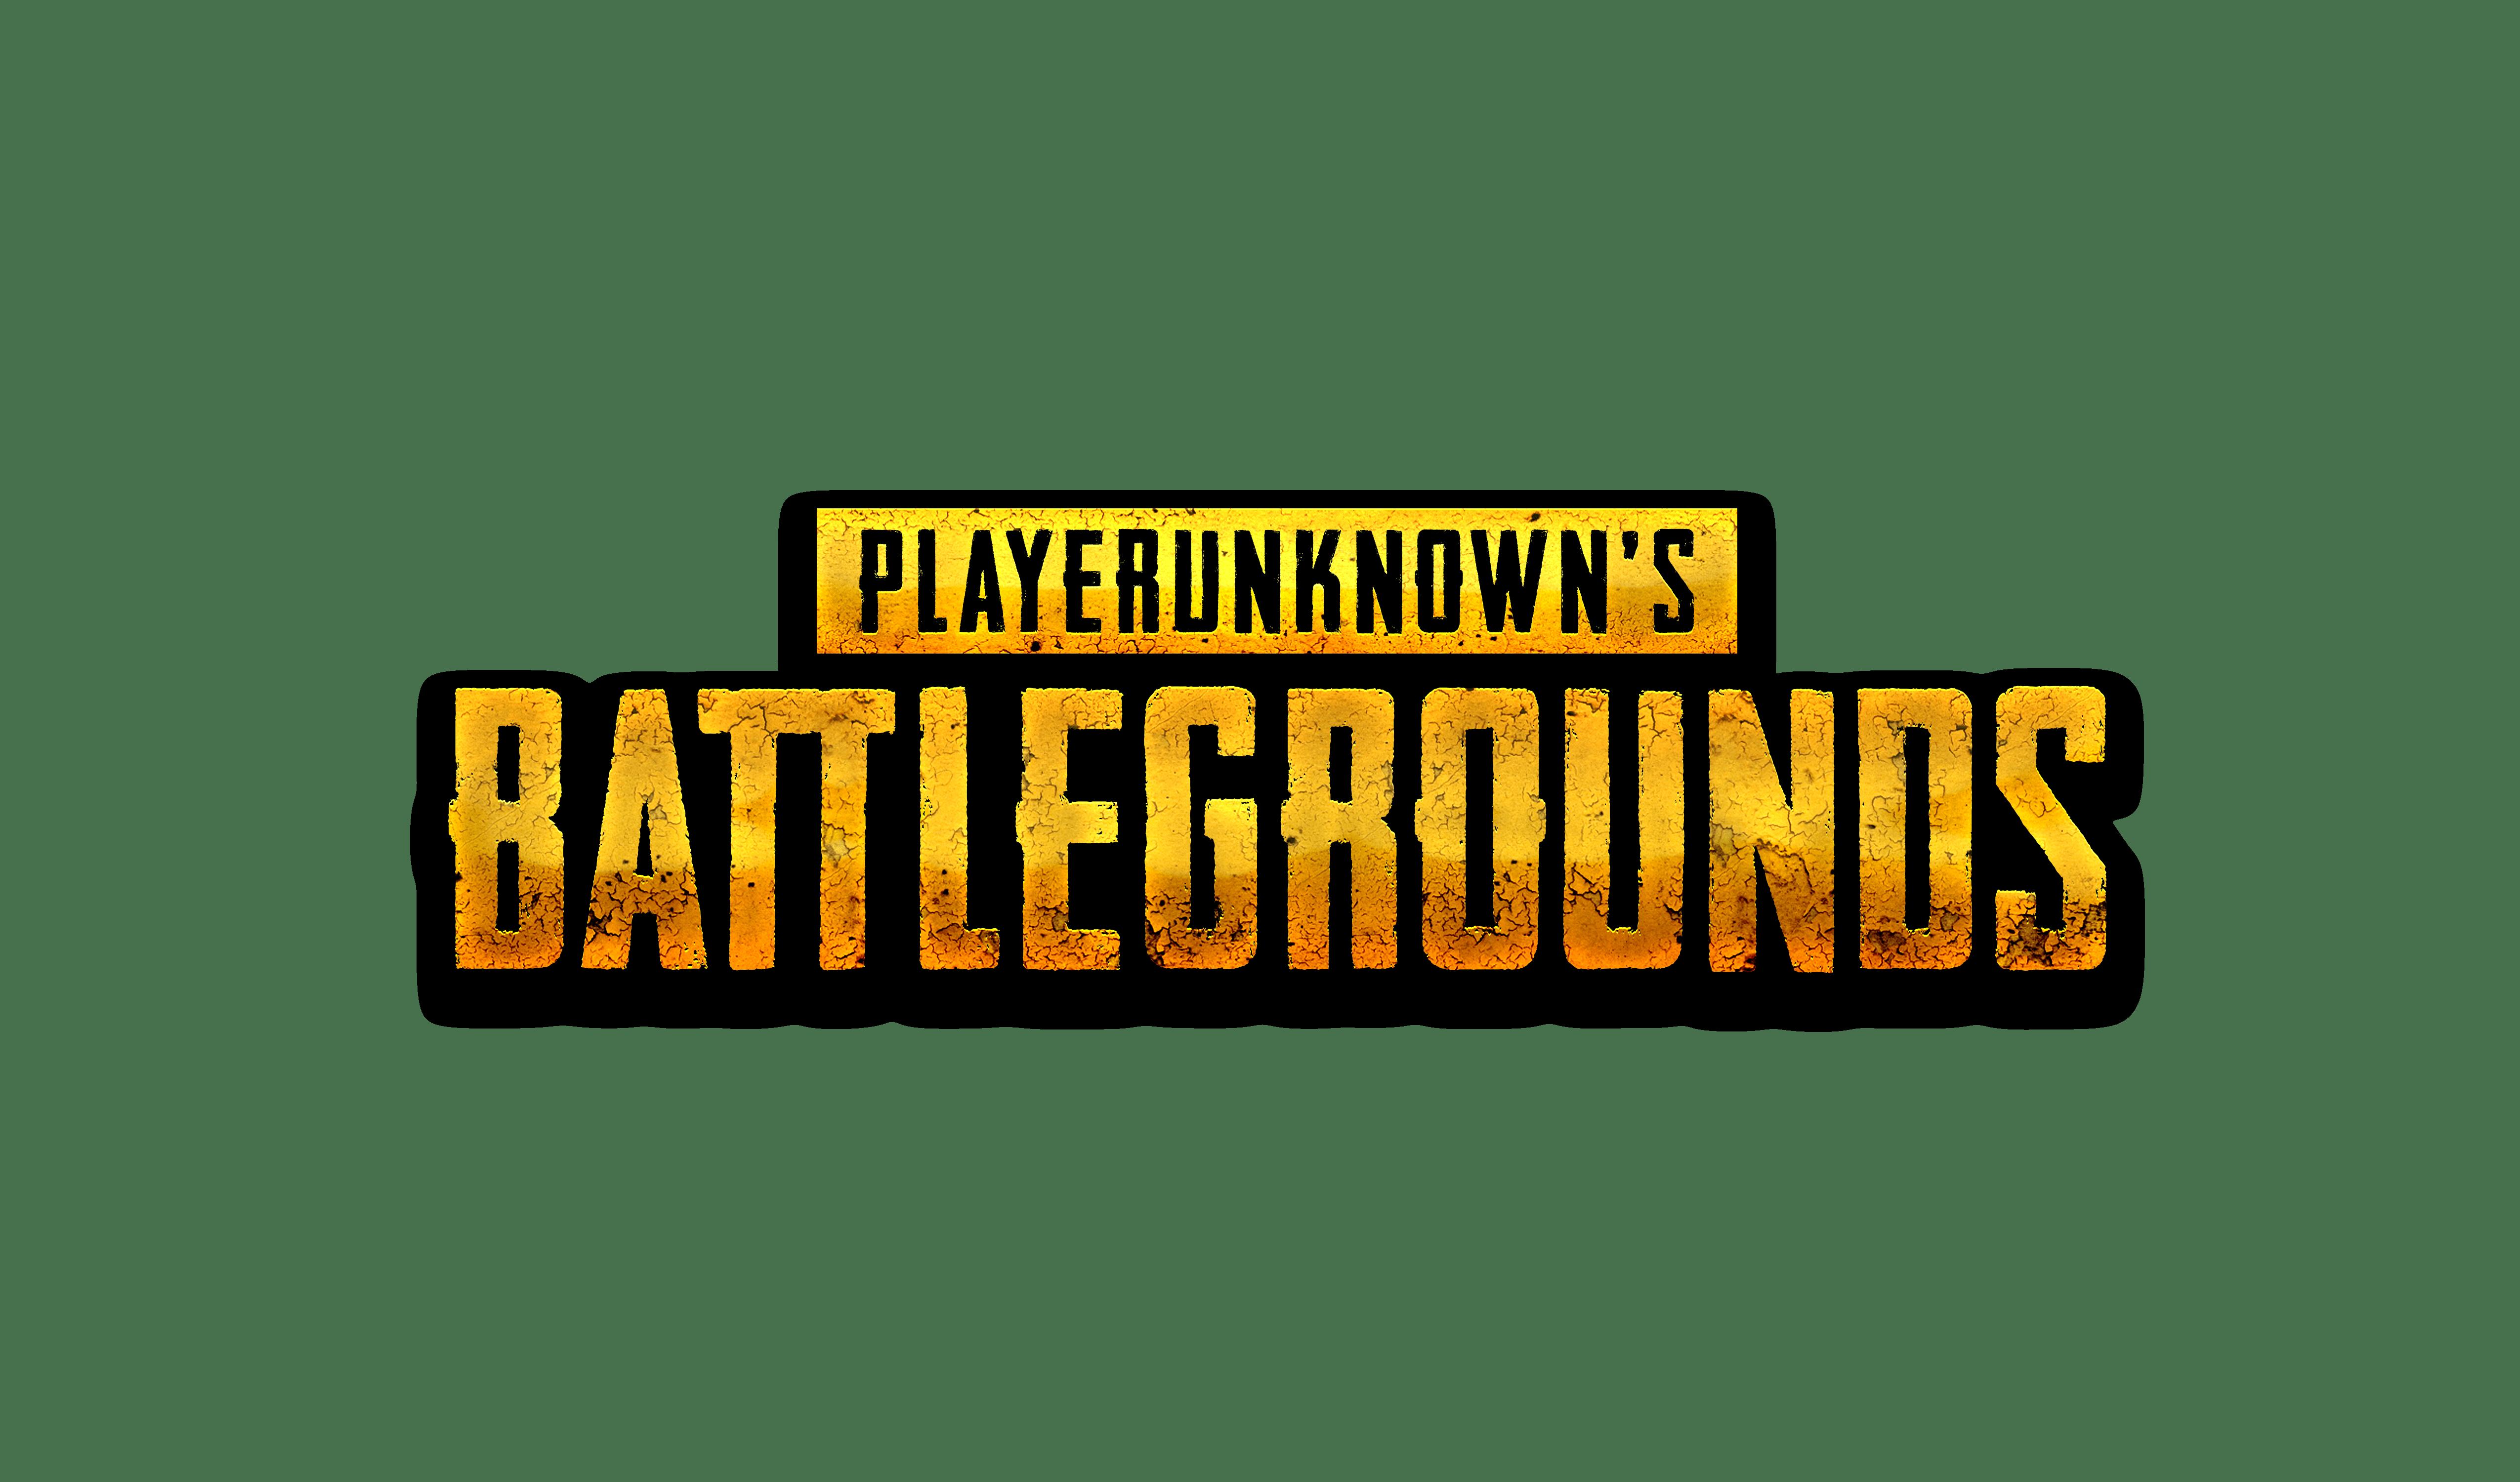 Playerunknown's Battlegrounds Logo (pubg) PNG Image.